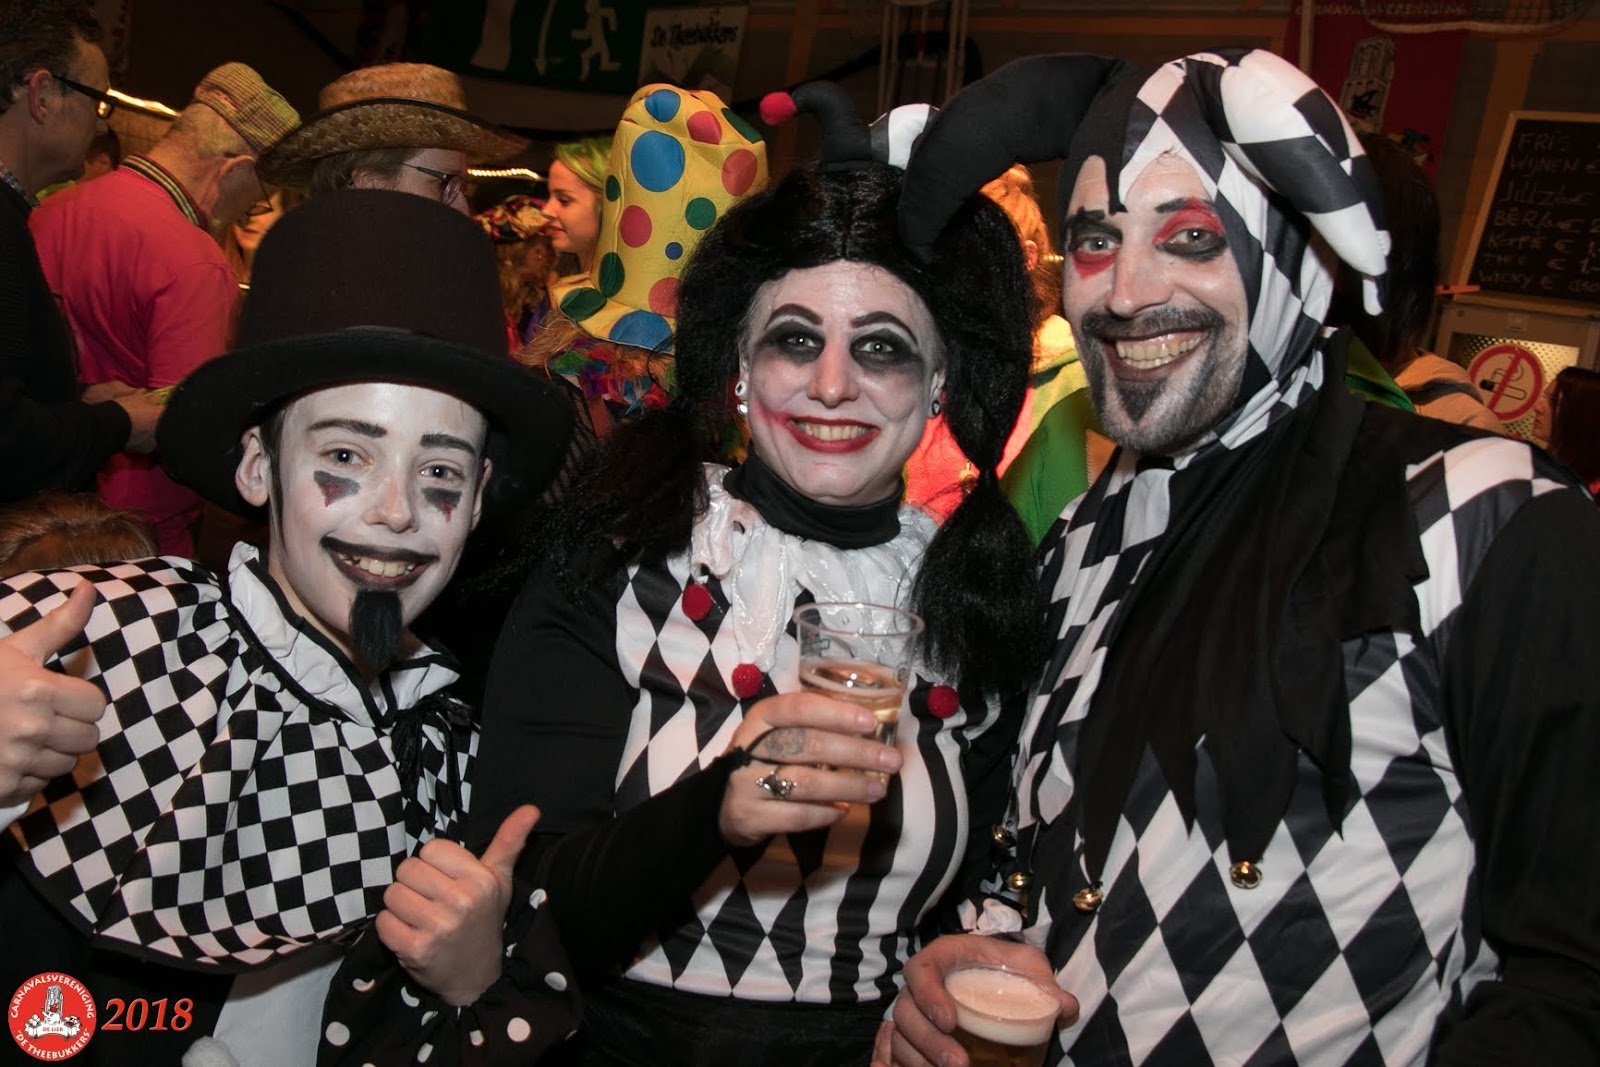 a Familie Carnaval 2018 - FamilieCarnavalTheebukkers2018-2008.jpg